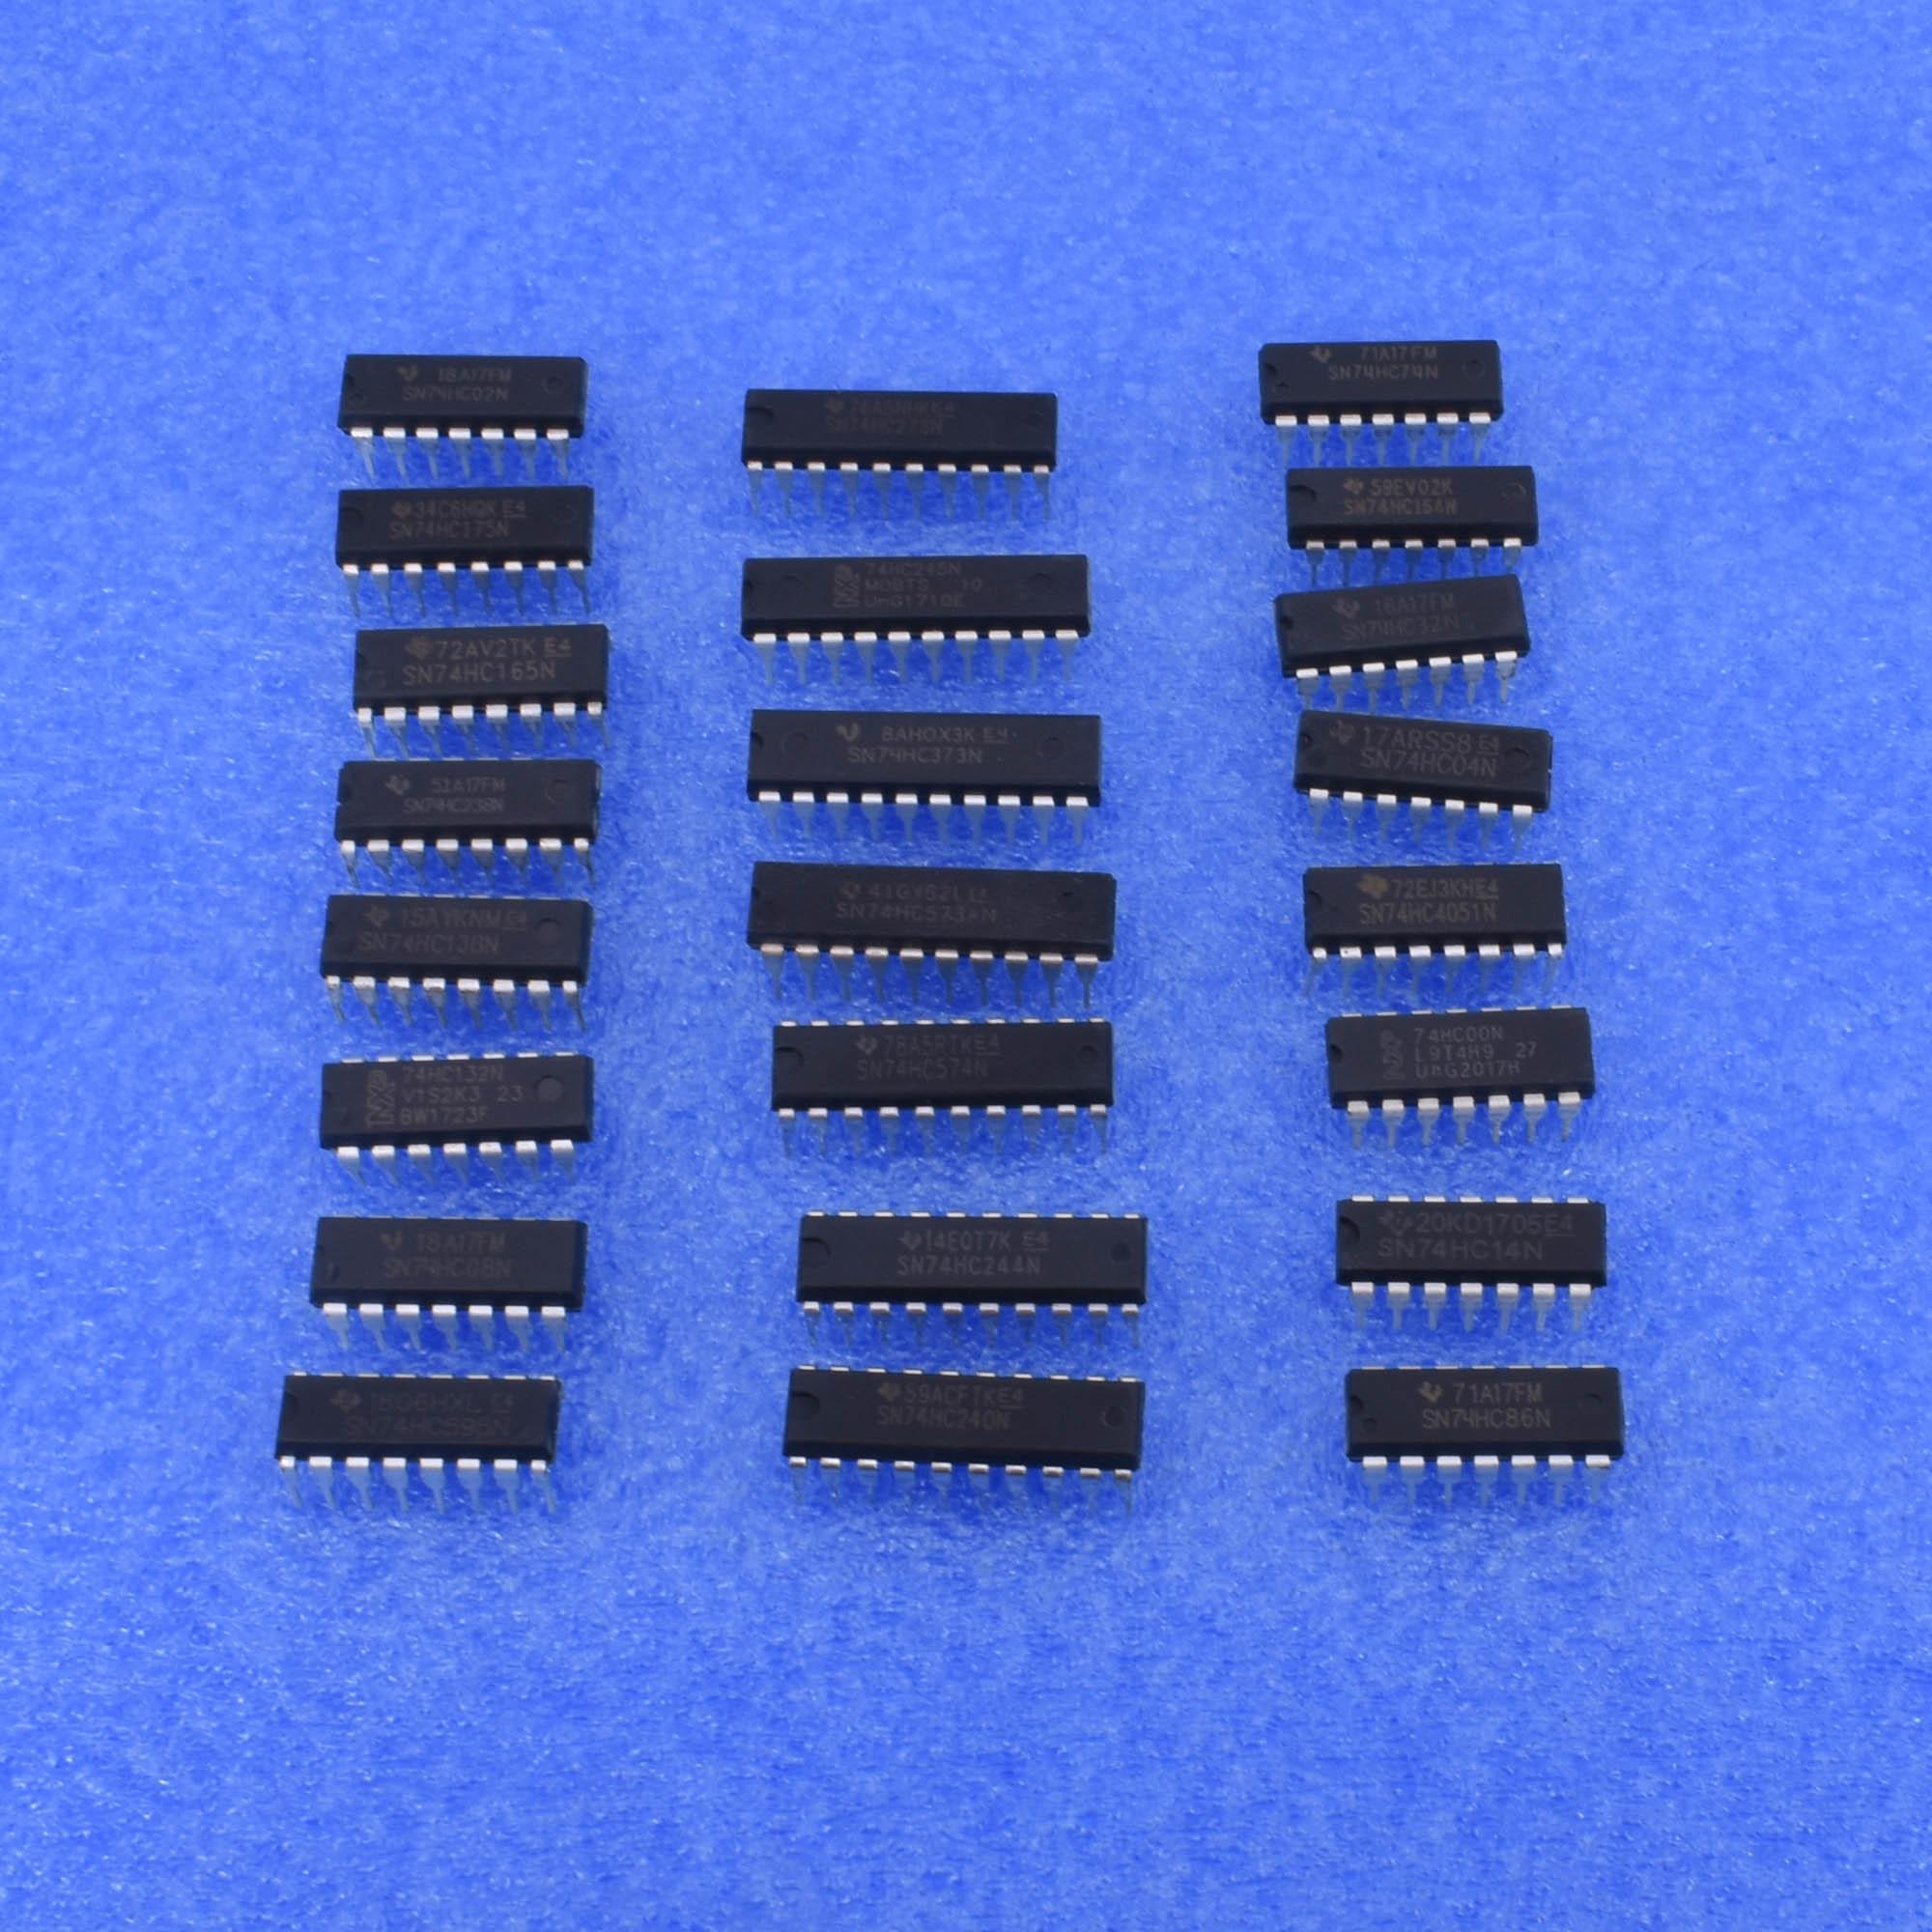 DIP SN74HC00N-SN74HC574N 74HC4051 74HC04N 74HC08N 74HC138N 74HC238N 74HC373N US